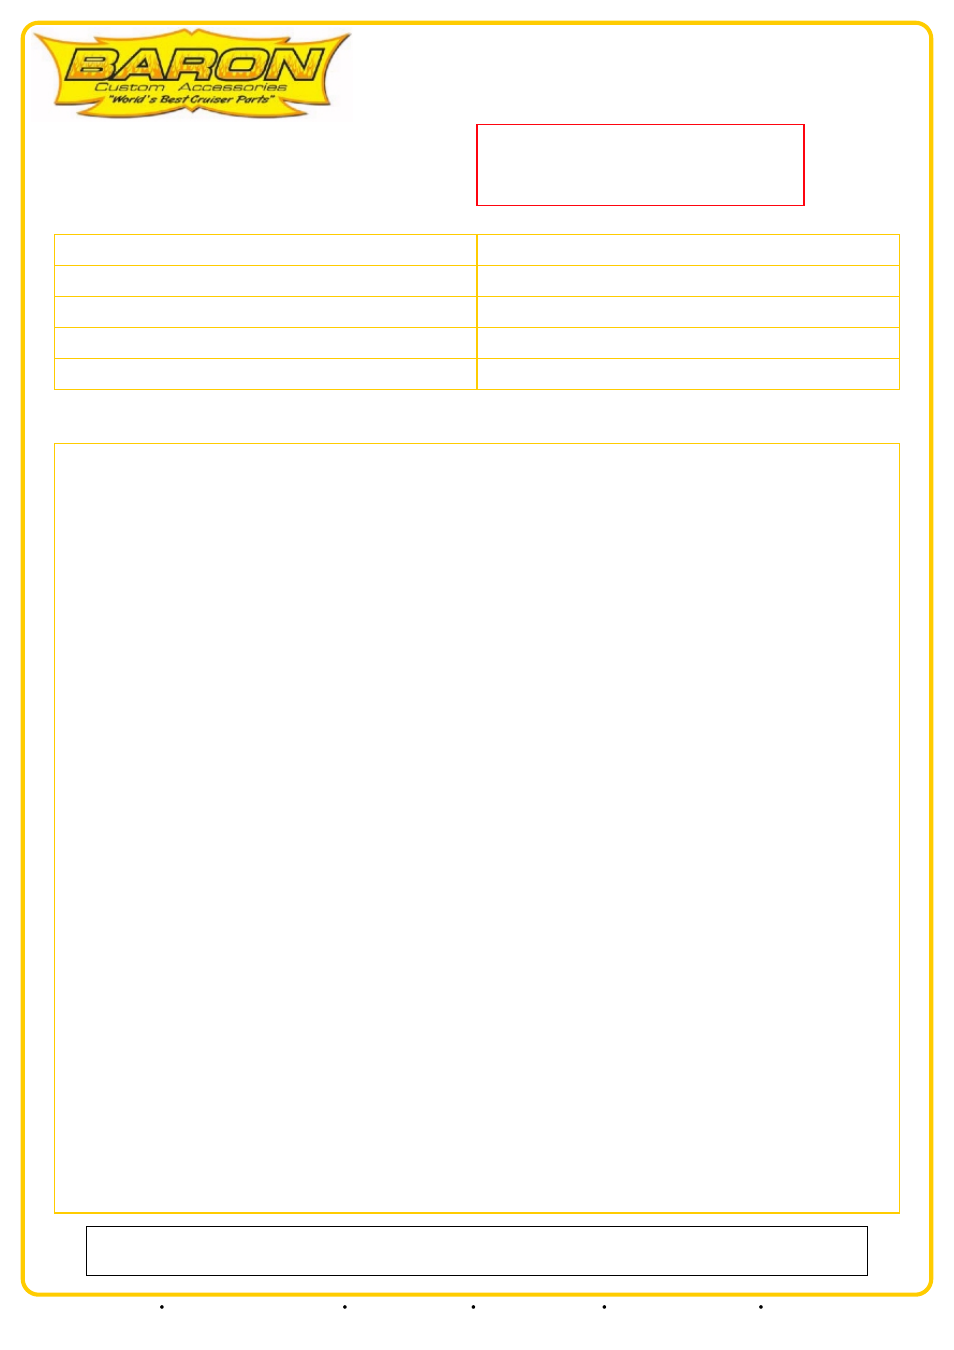 Baron Air Fuel Pump Relocation Kit Yamaha Road Star User Carburetor Wiring Harness Manual 3 Pages